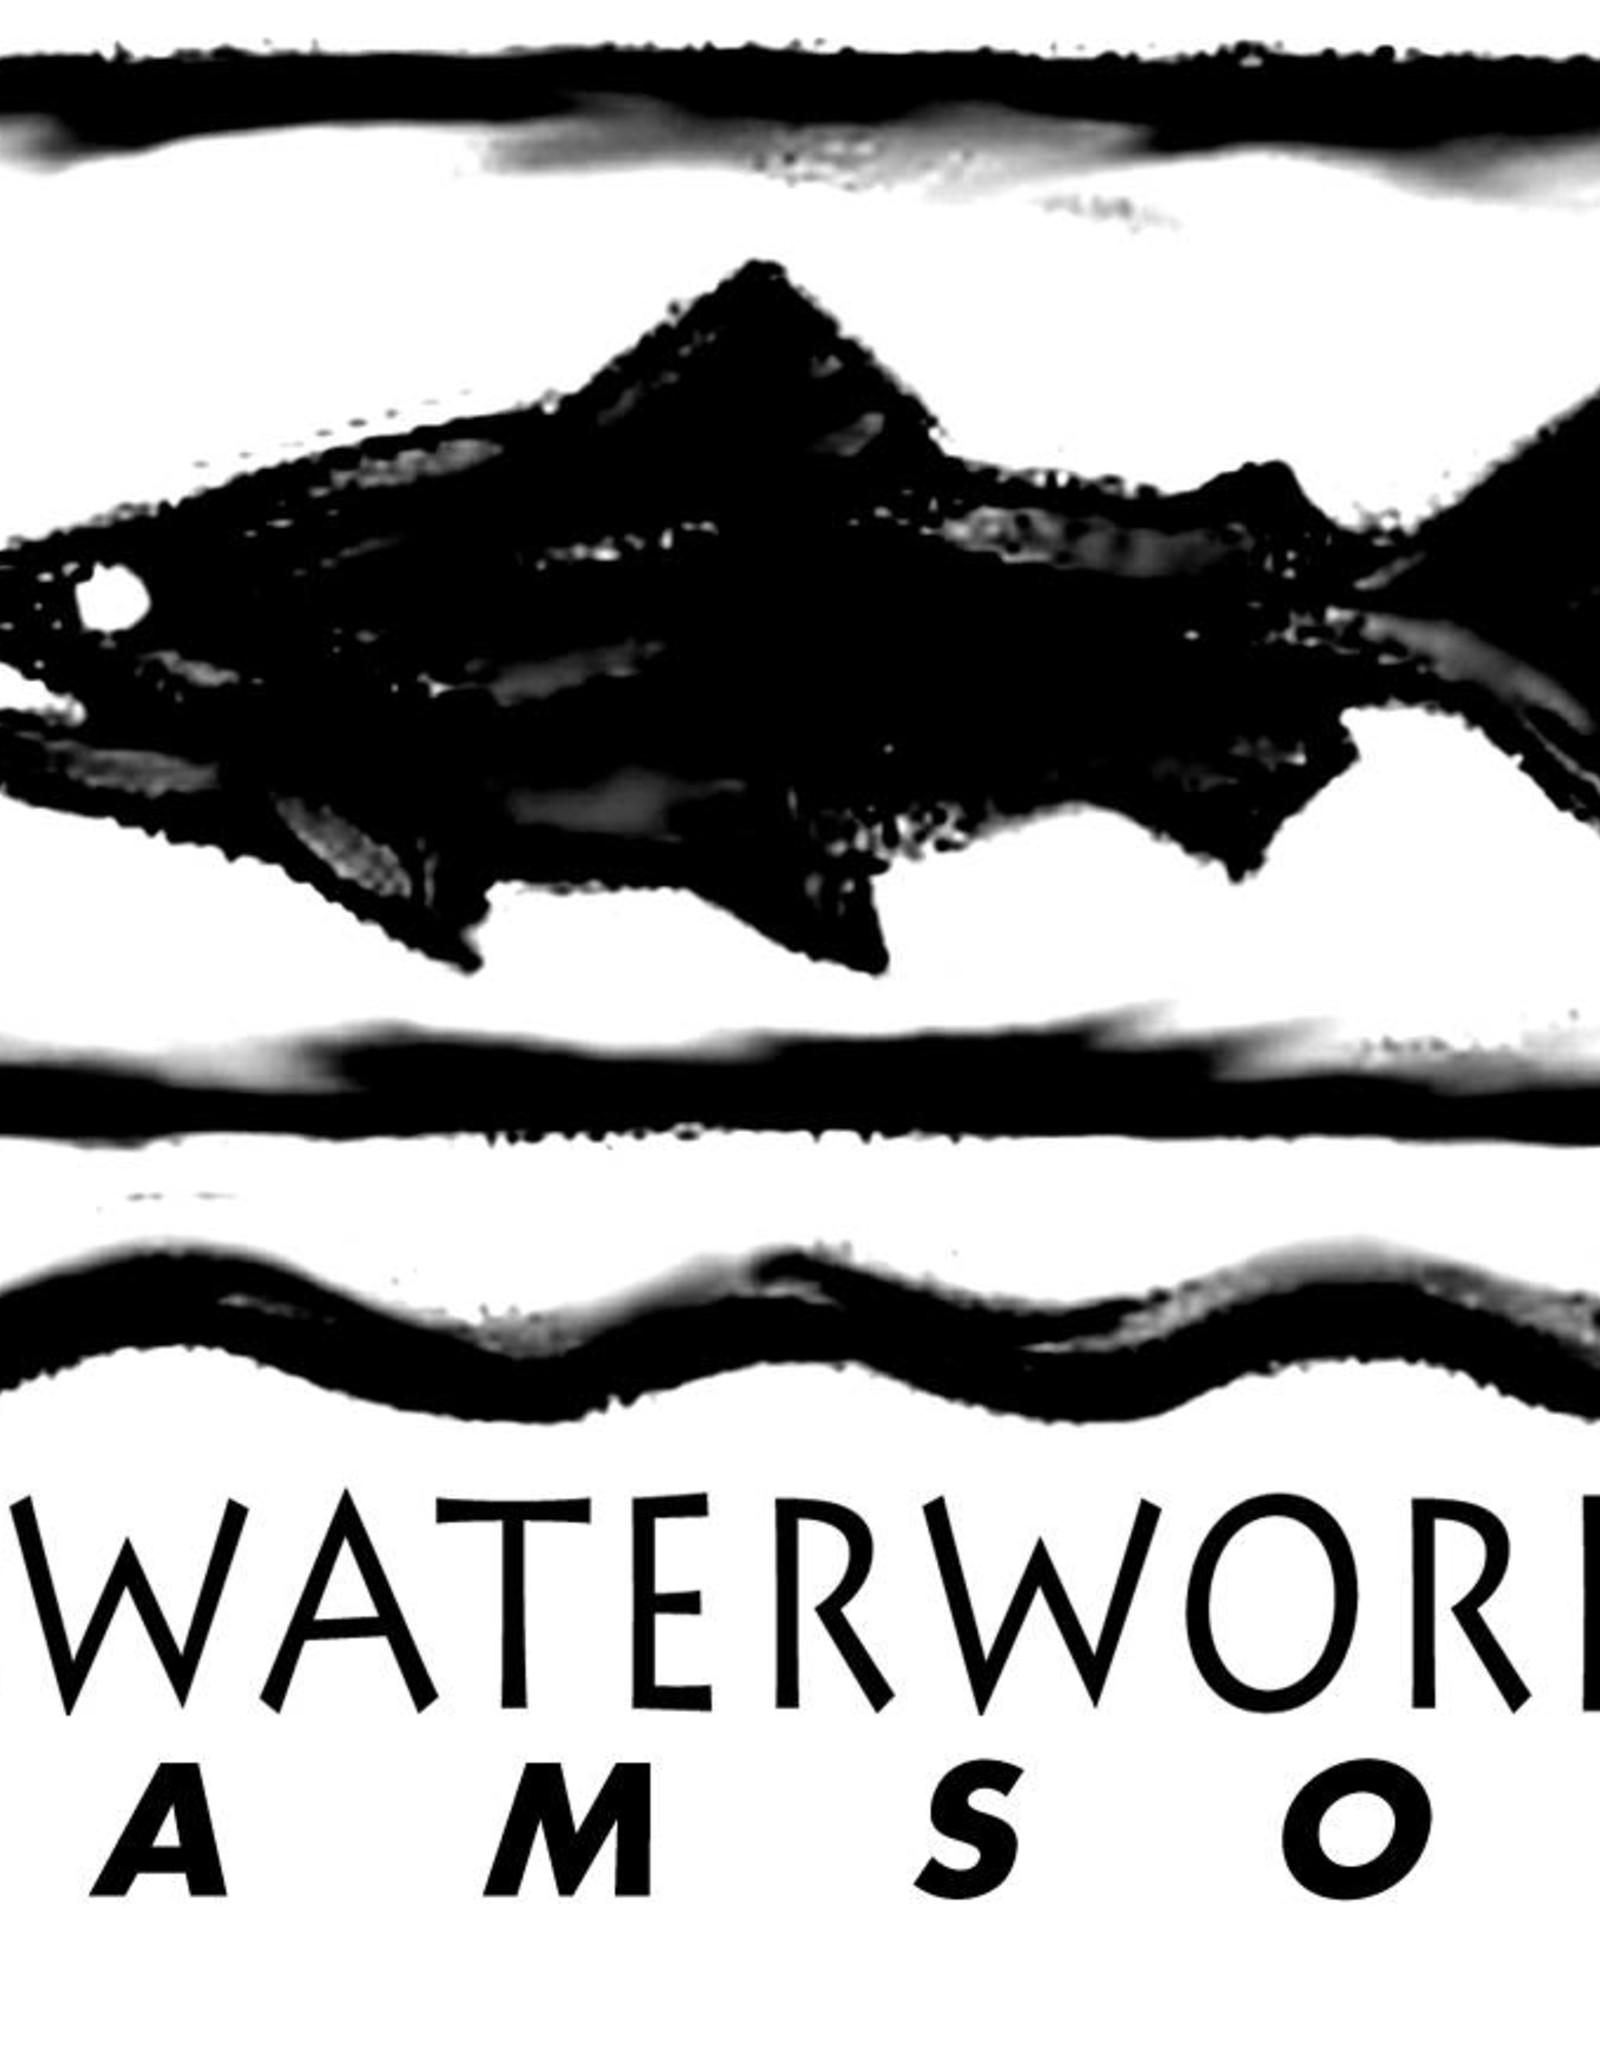 Waterworks Lamson WW/Lamson Sticker